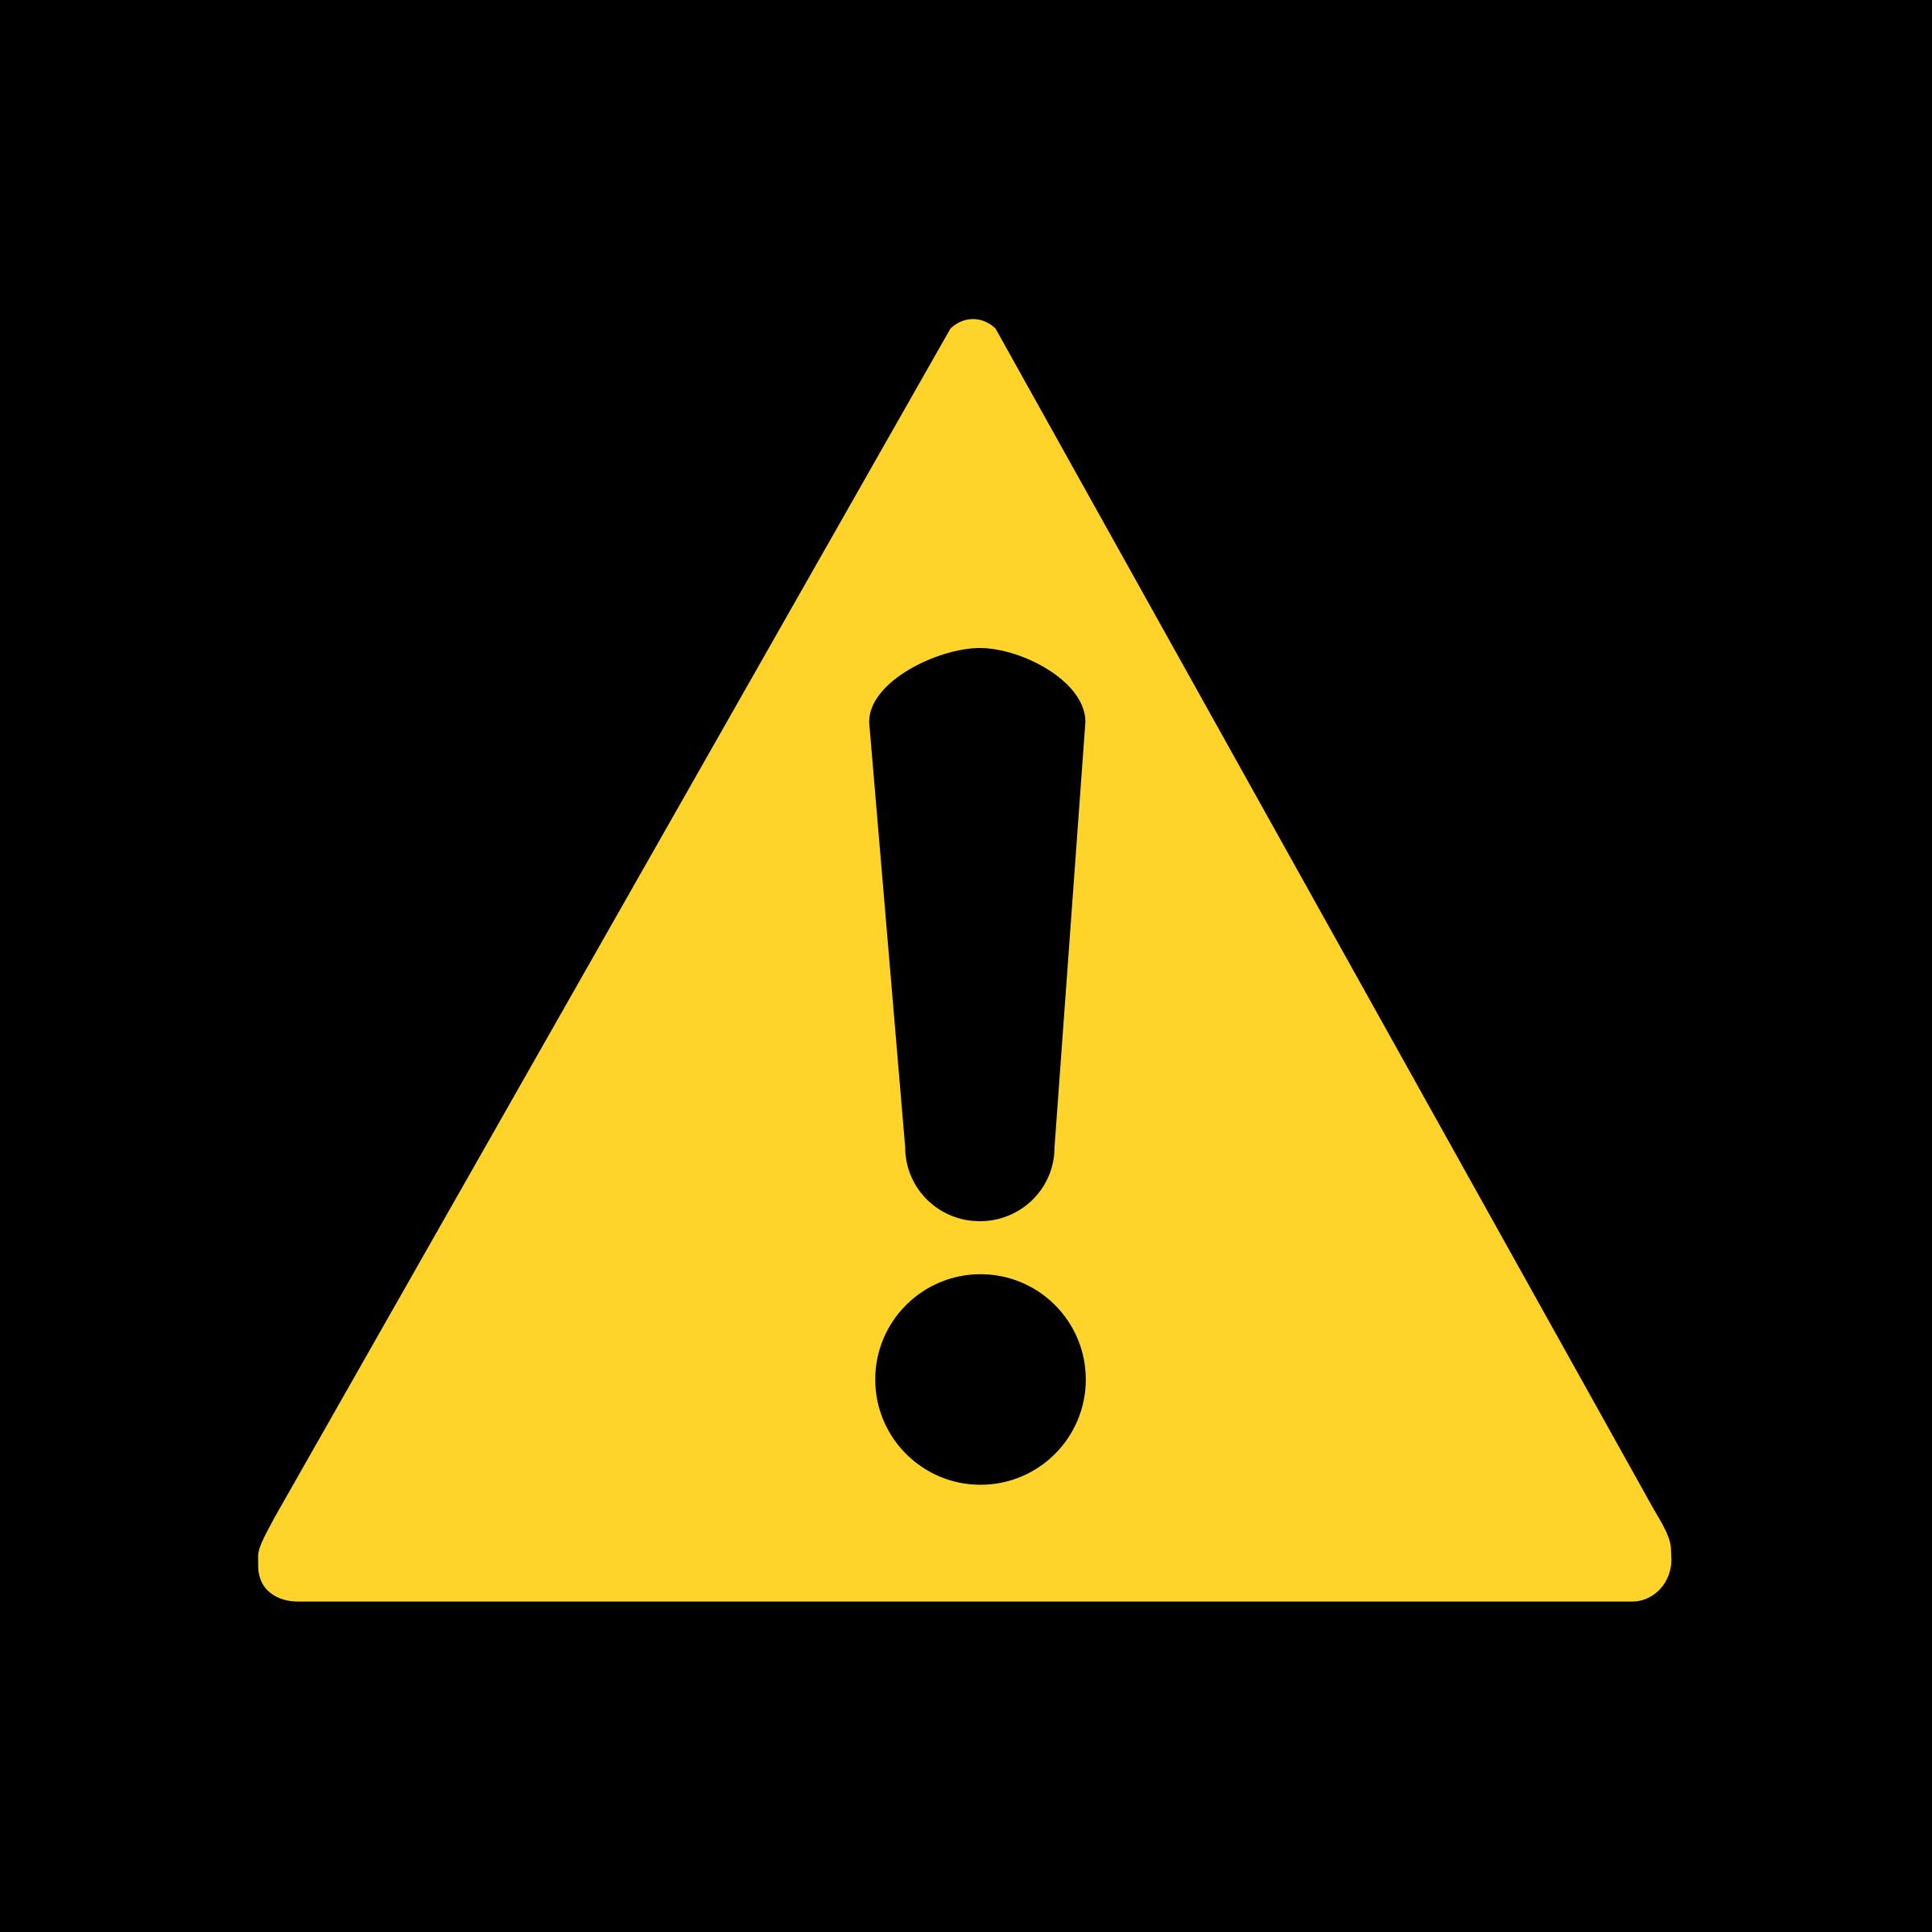 warning-icon-24